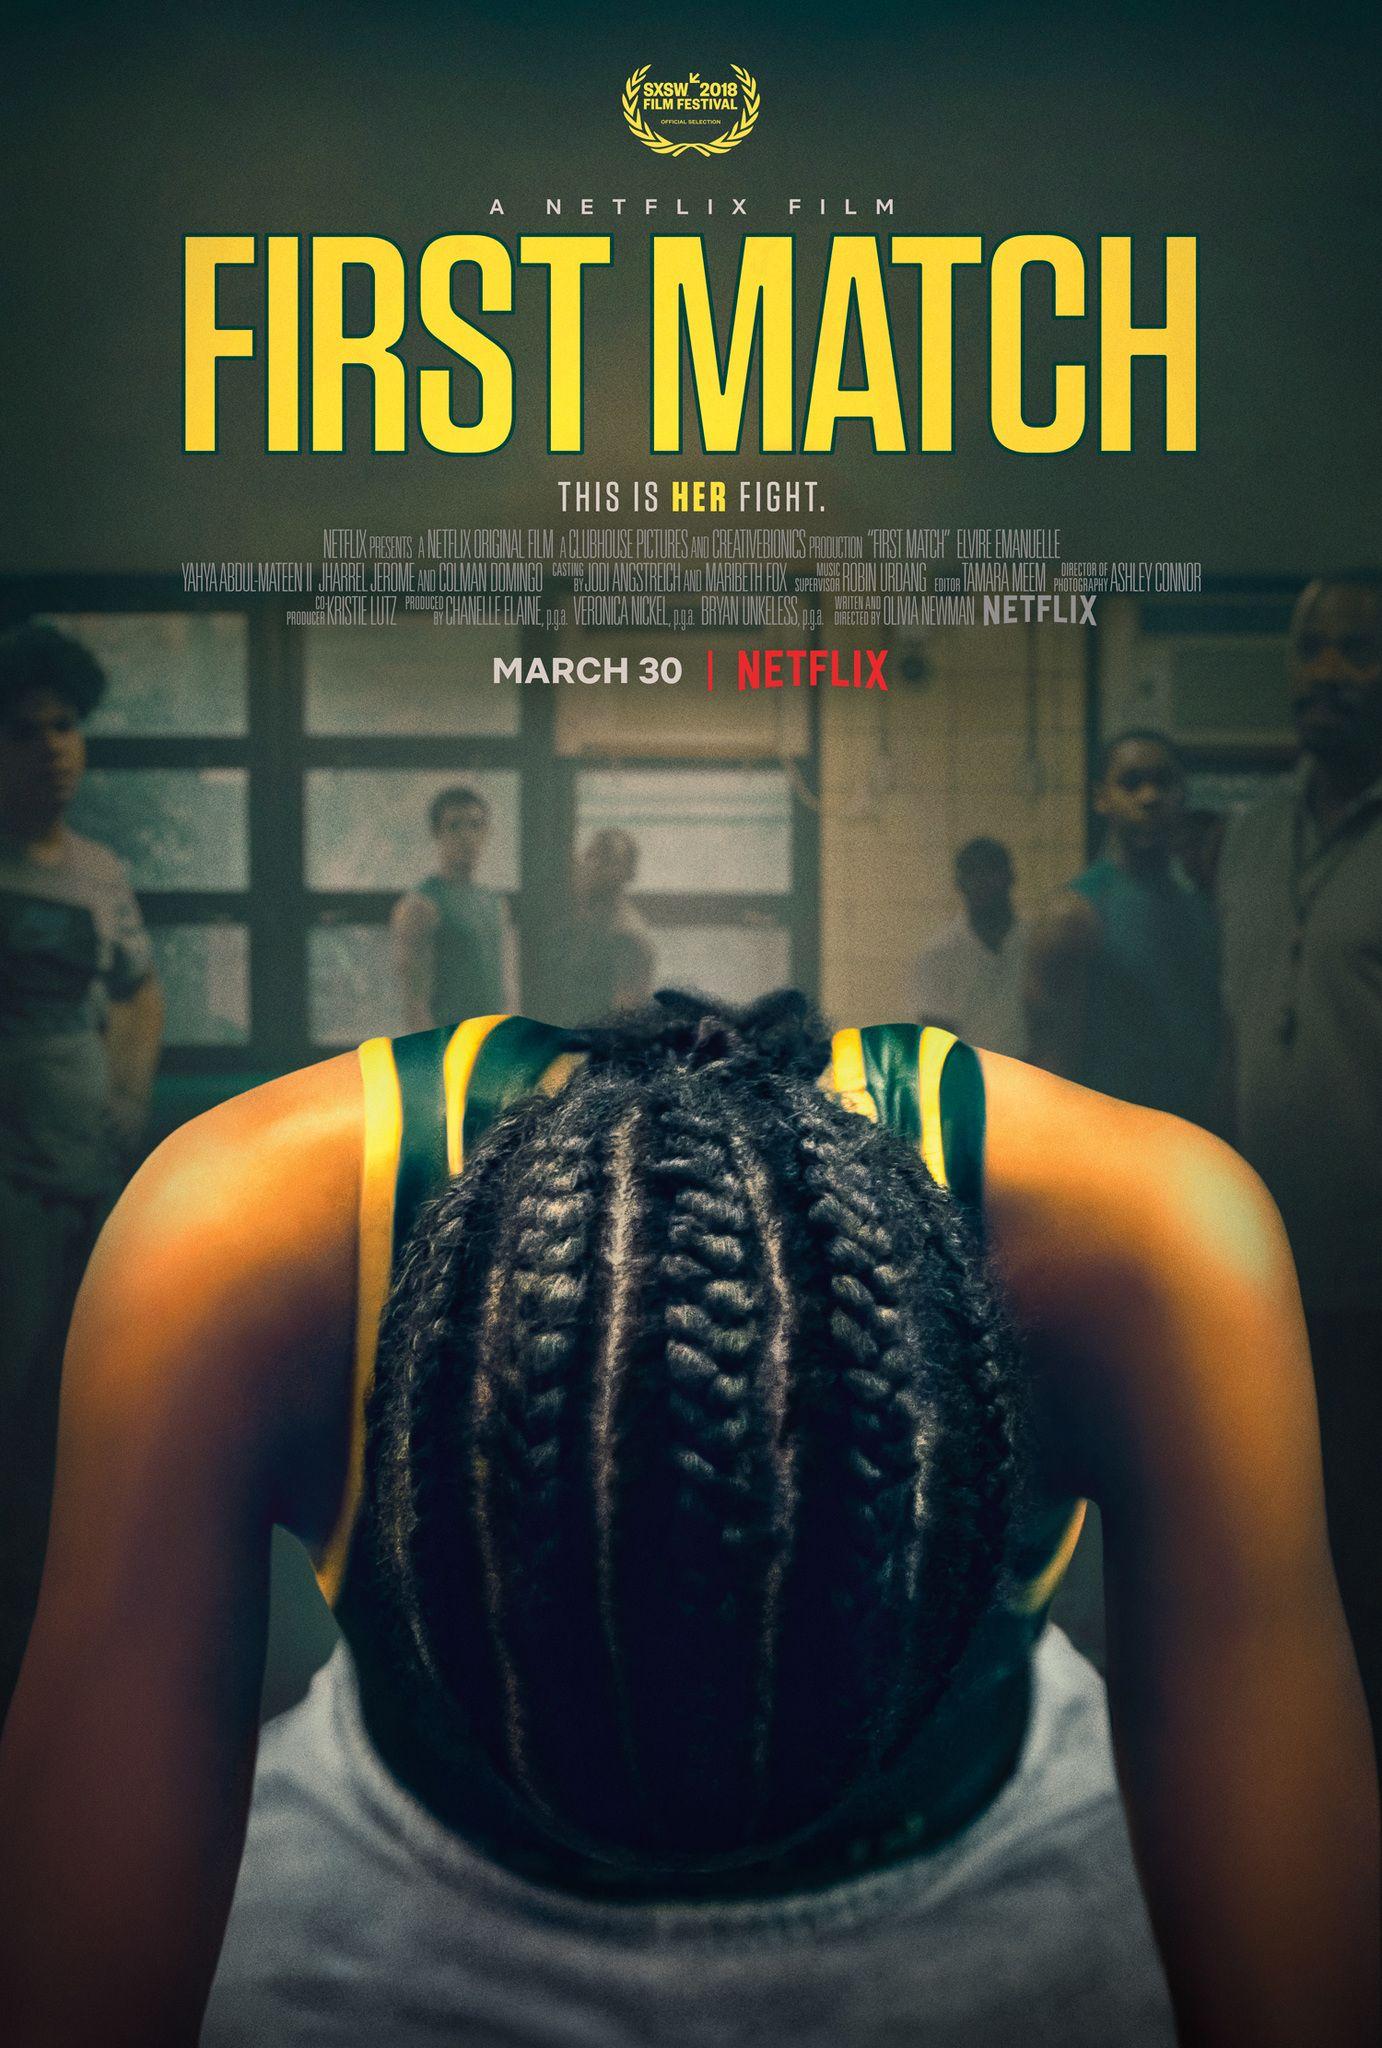 First Match Netflix movies to watch, Netflix movies, Netflix